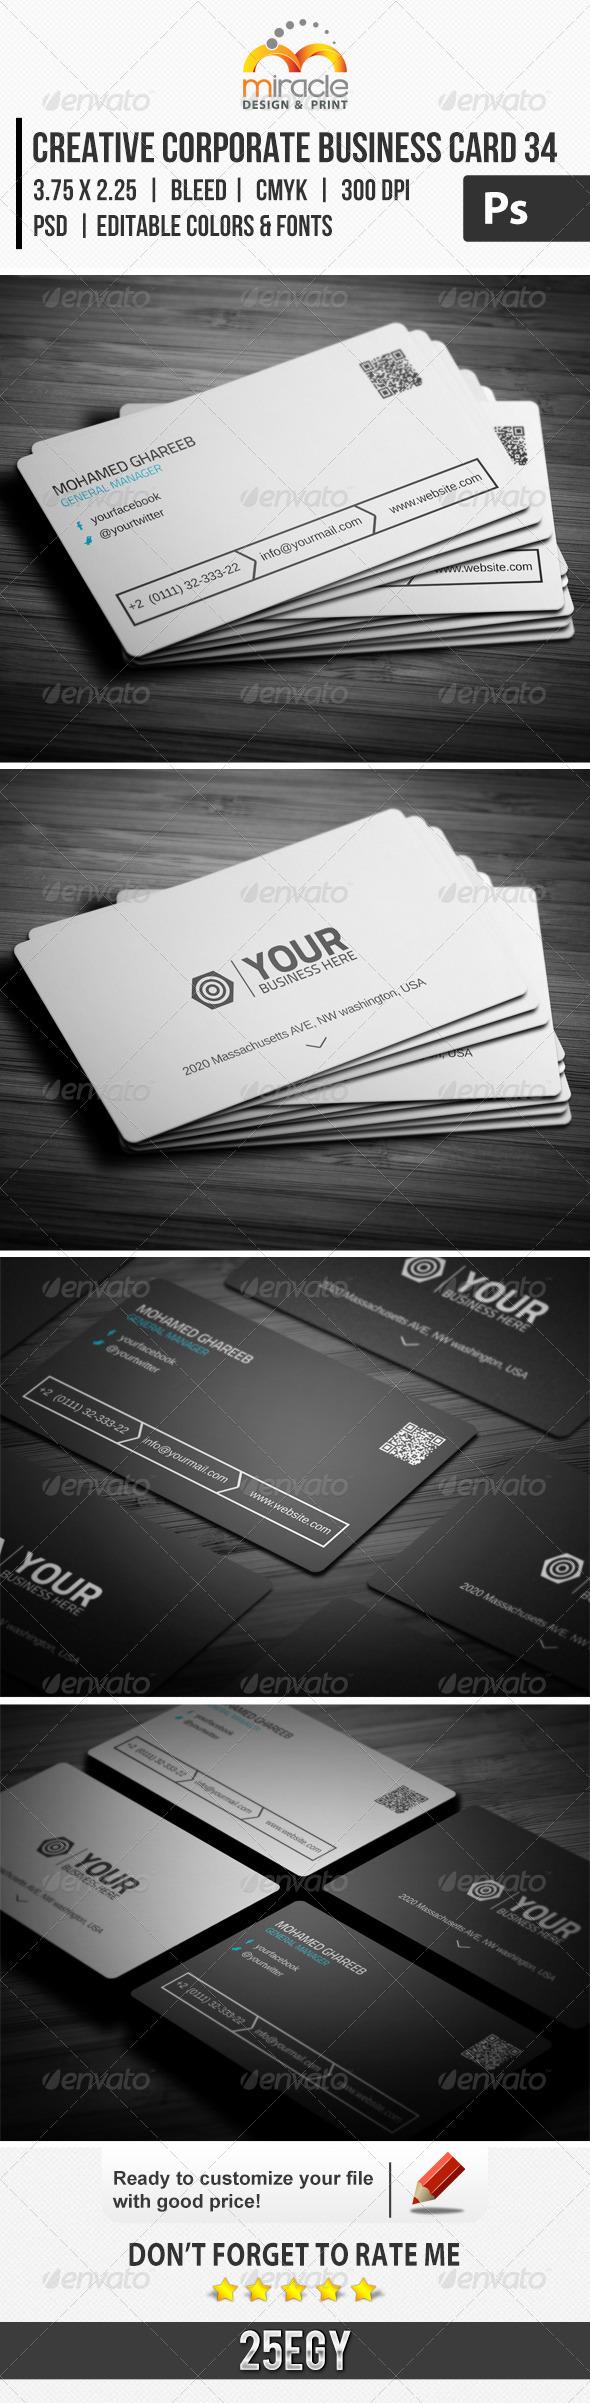 Creative Corporate Business Card 34 - Corporate Business Cards